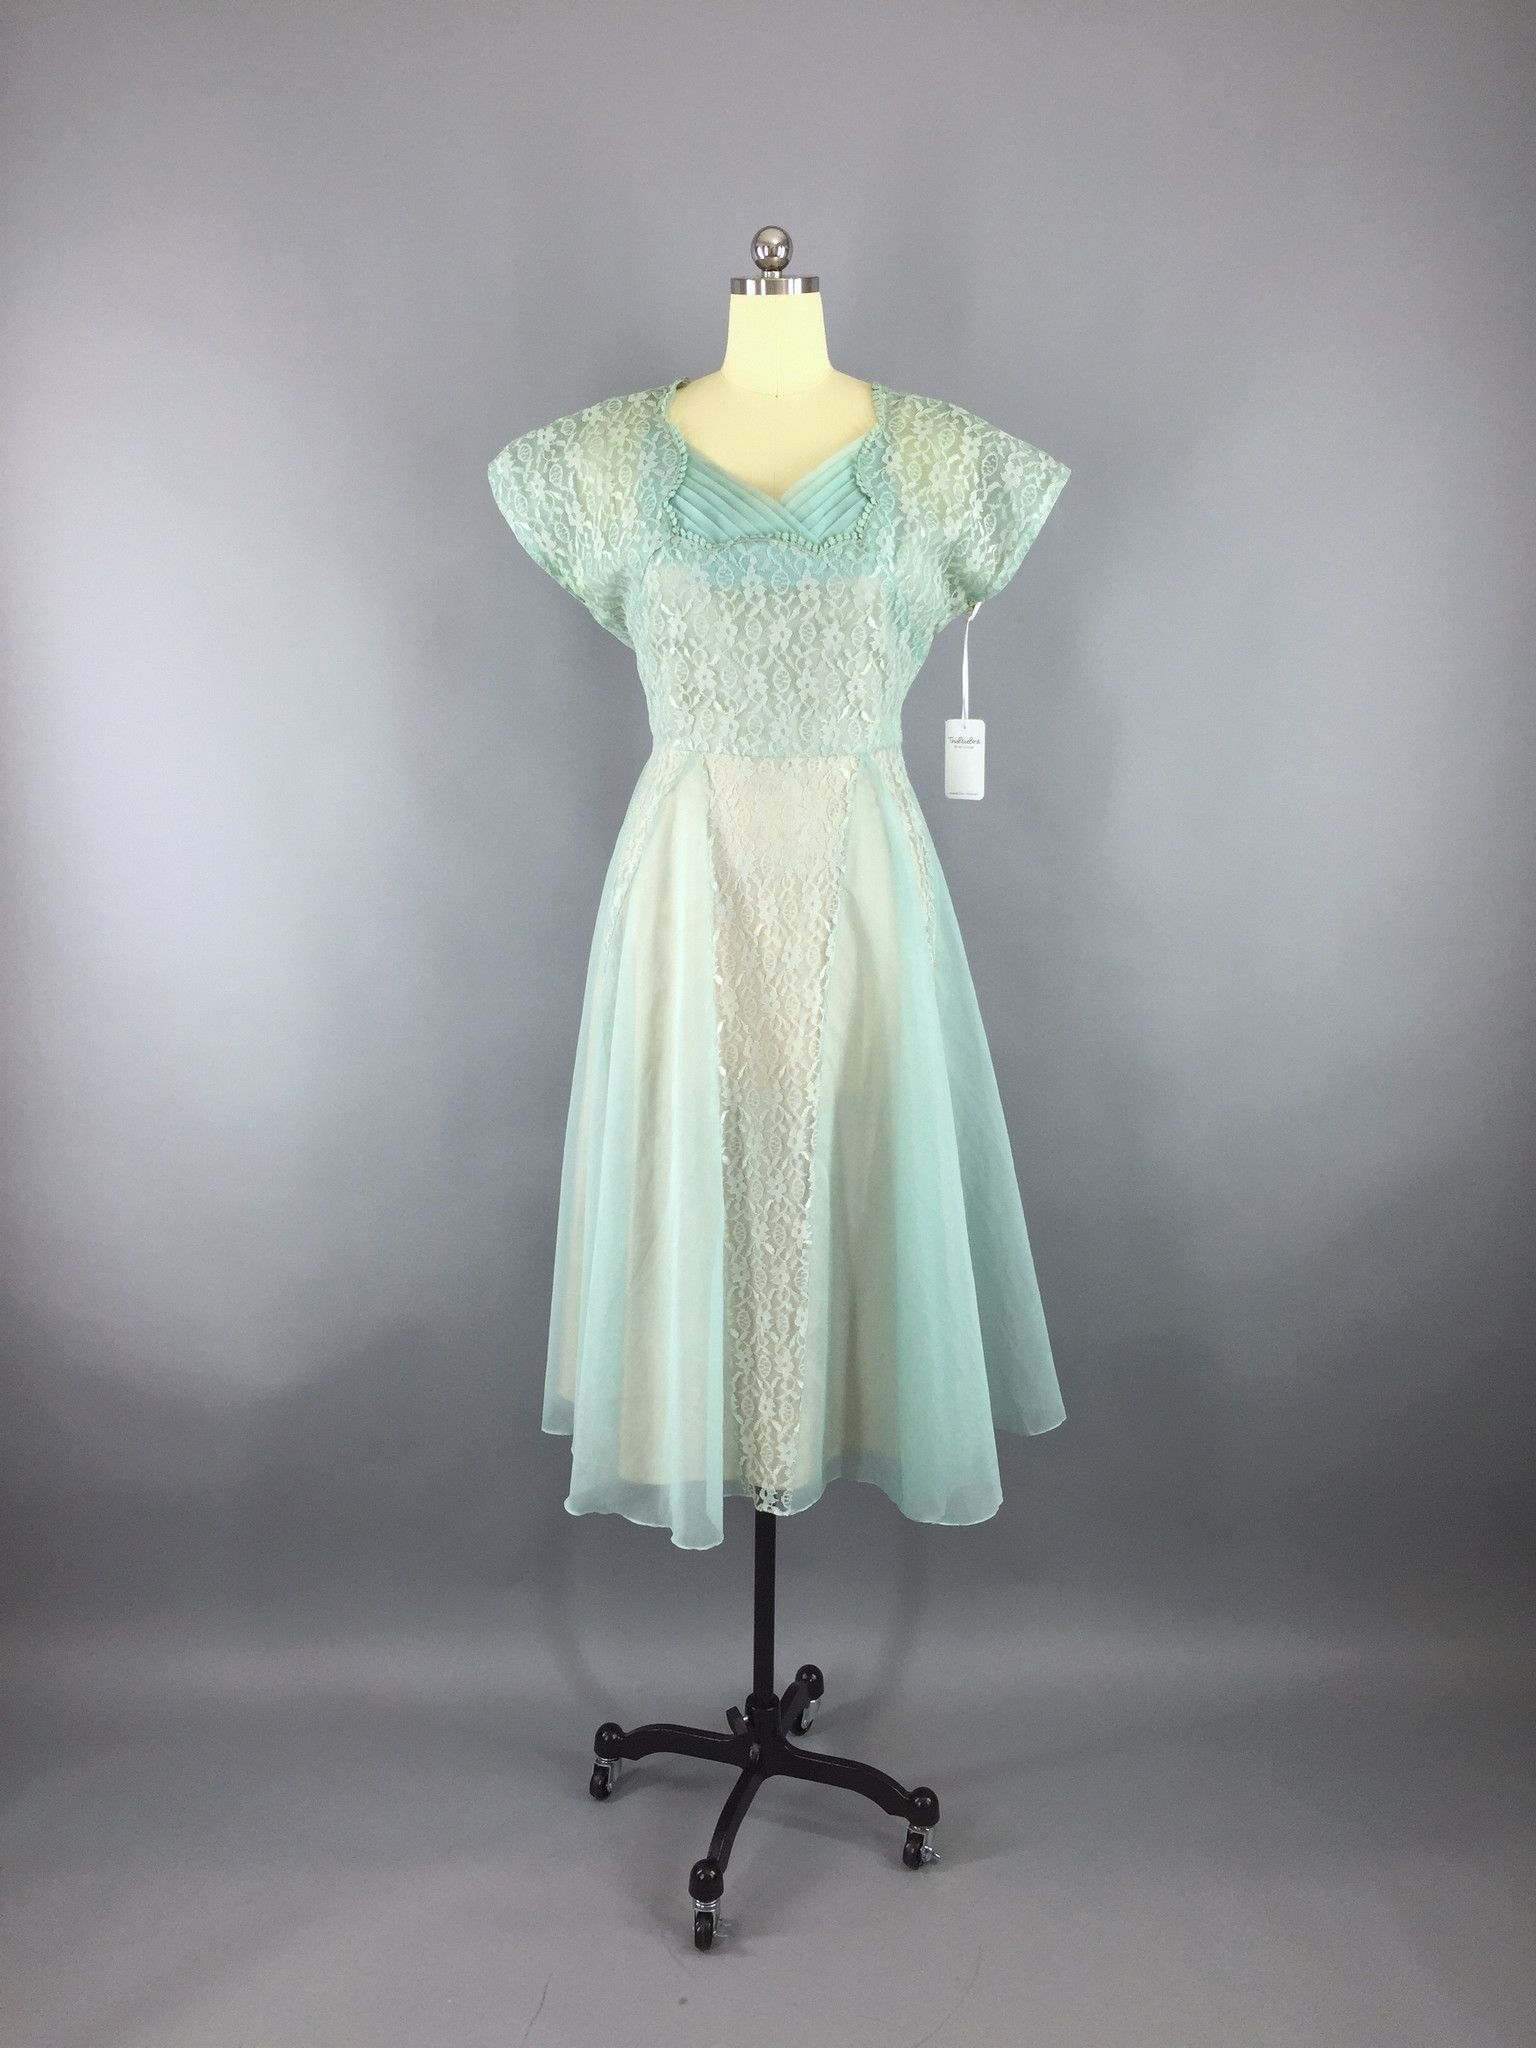 1950s lace dress  Vintage s Lace Dress  Sea Foam Green Chiffon  ThisBlueBird